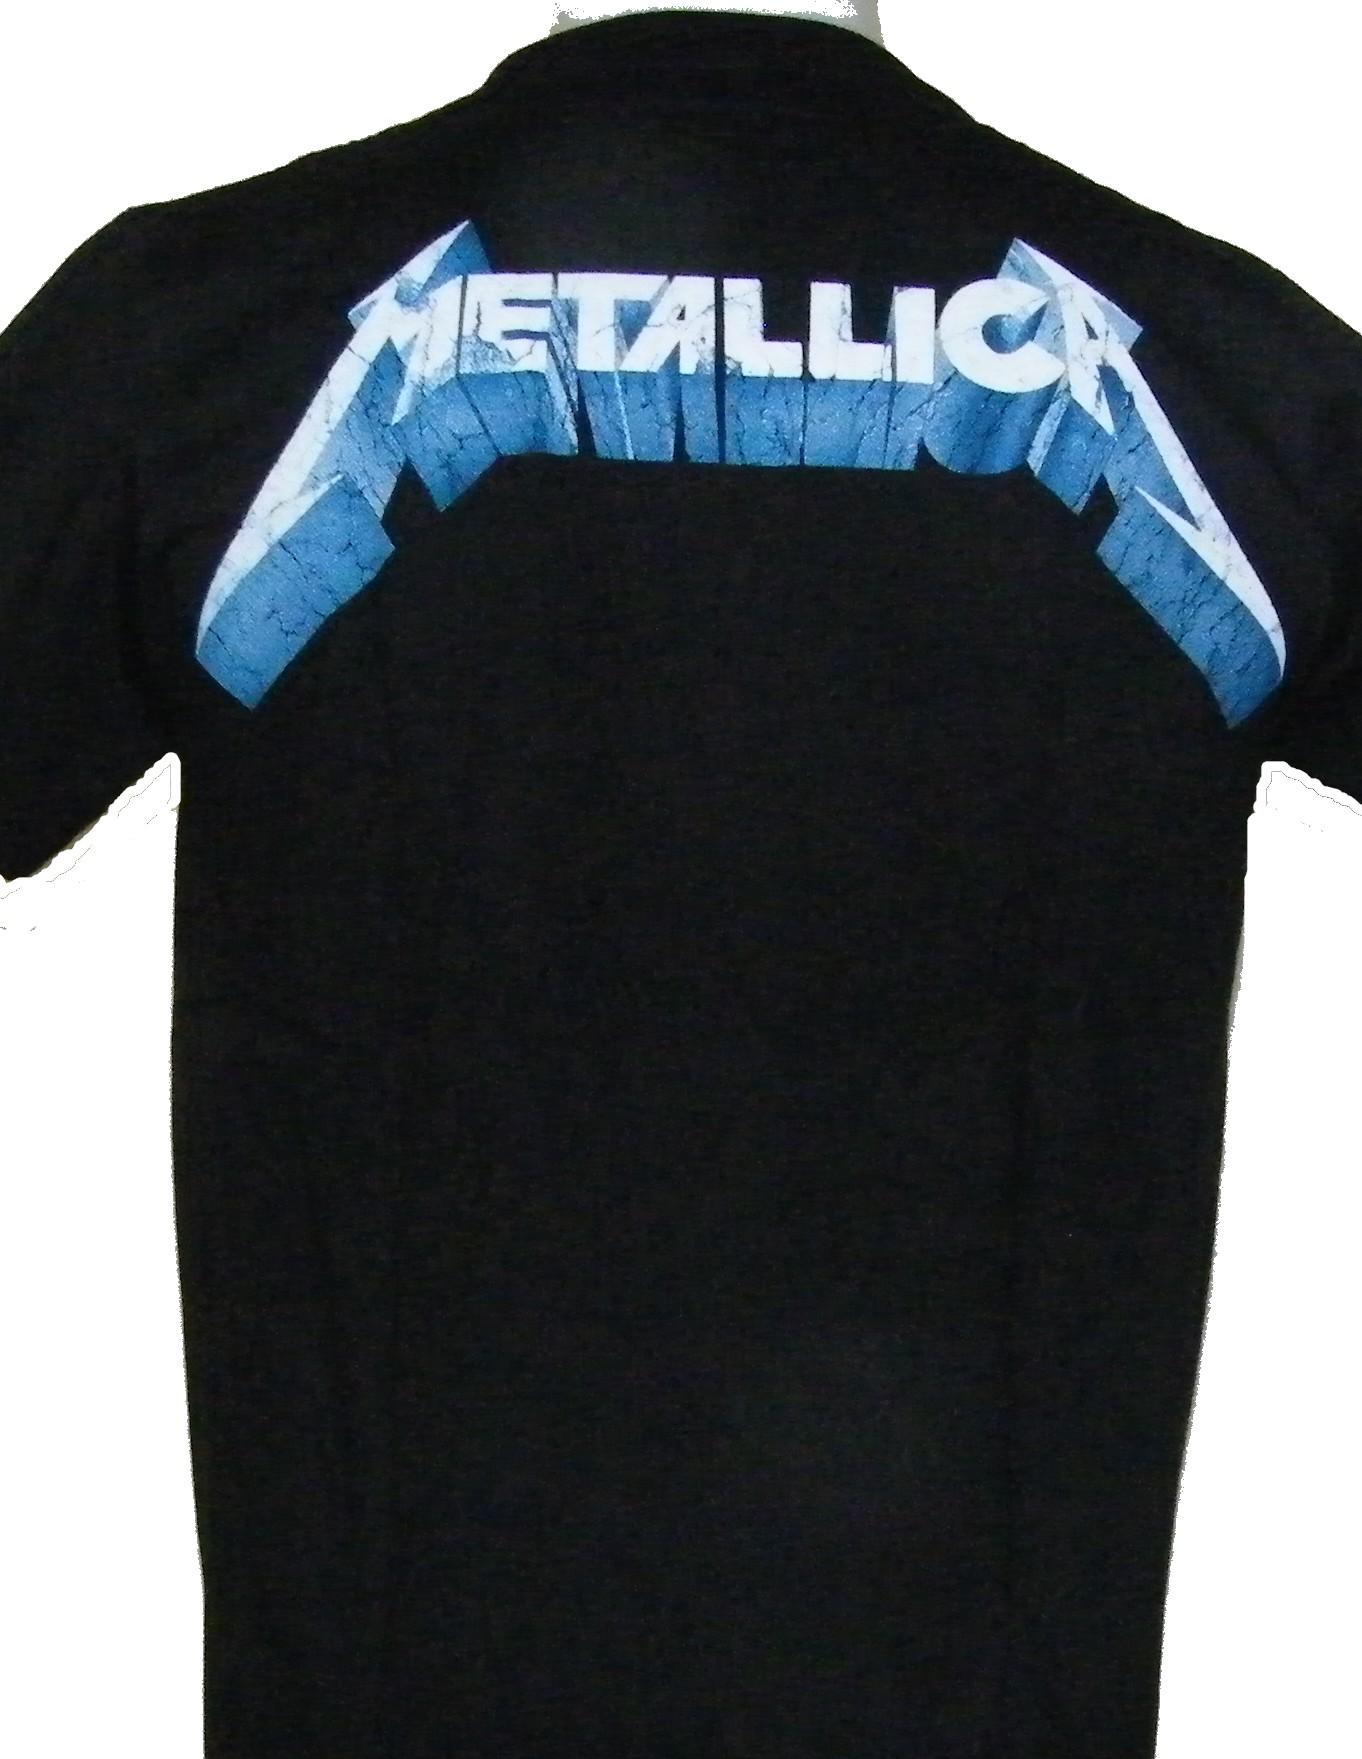 40cf3f7b9 Metallica t-shirt size S – RoxxBKK